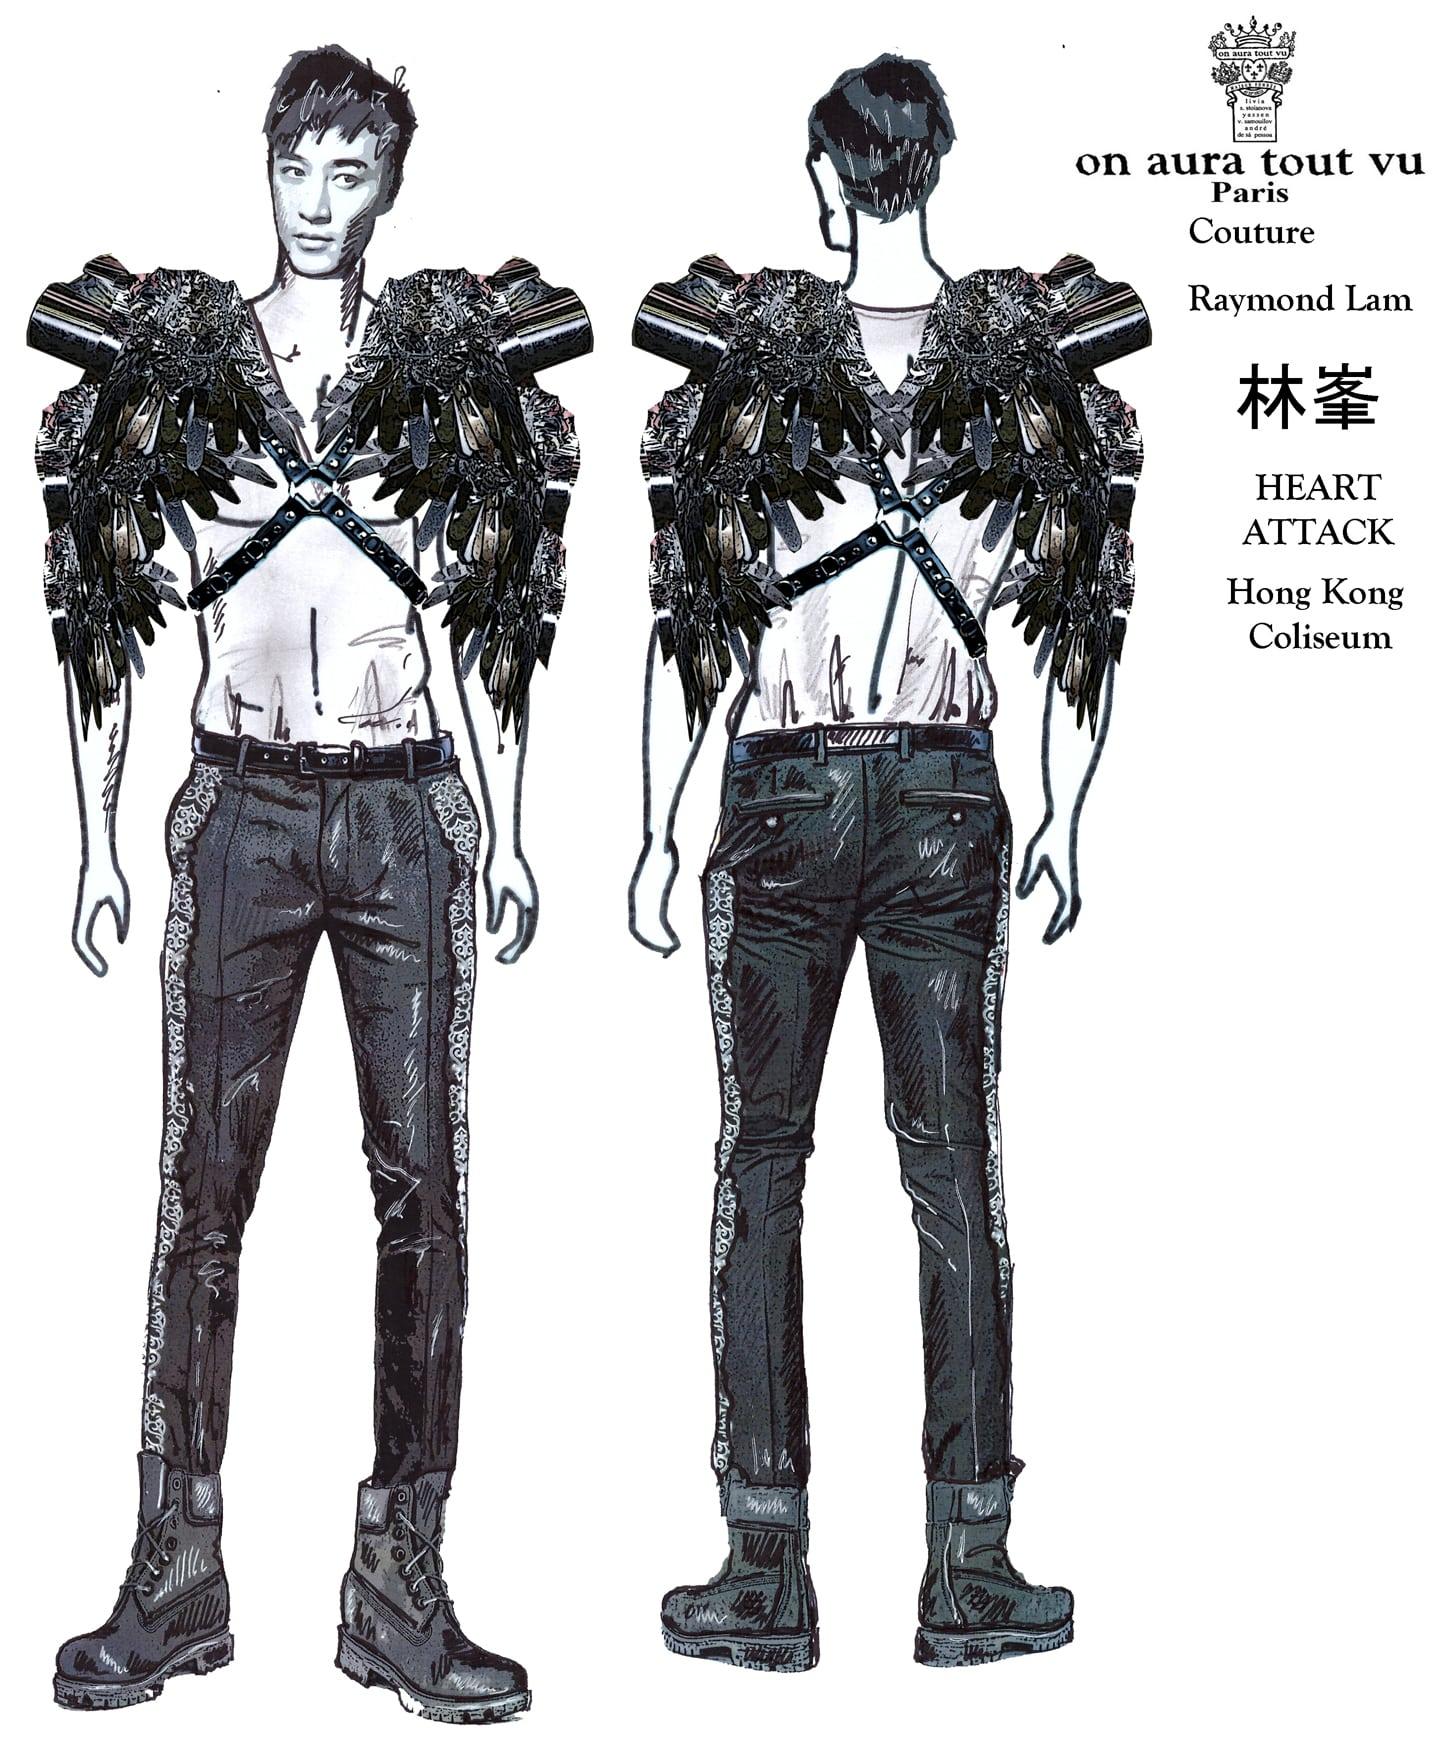 林峯 Raymond Lamcouture by on aura tout vu silver harness fashion